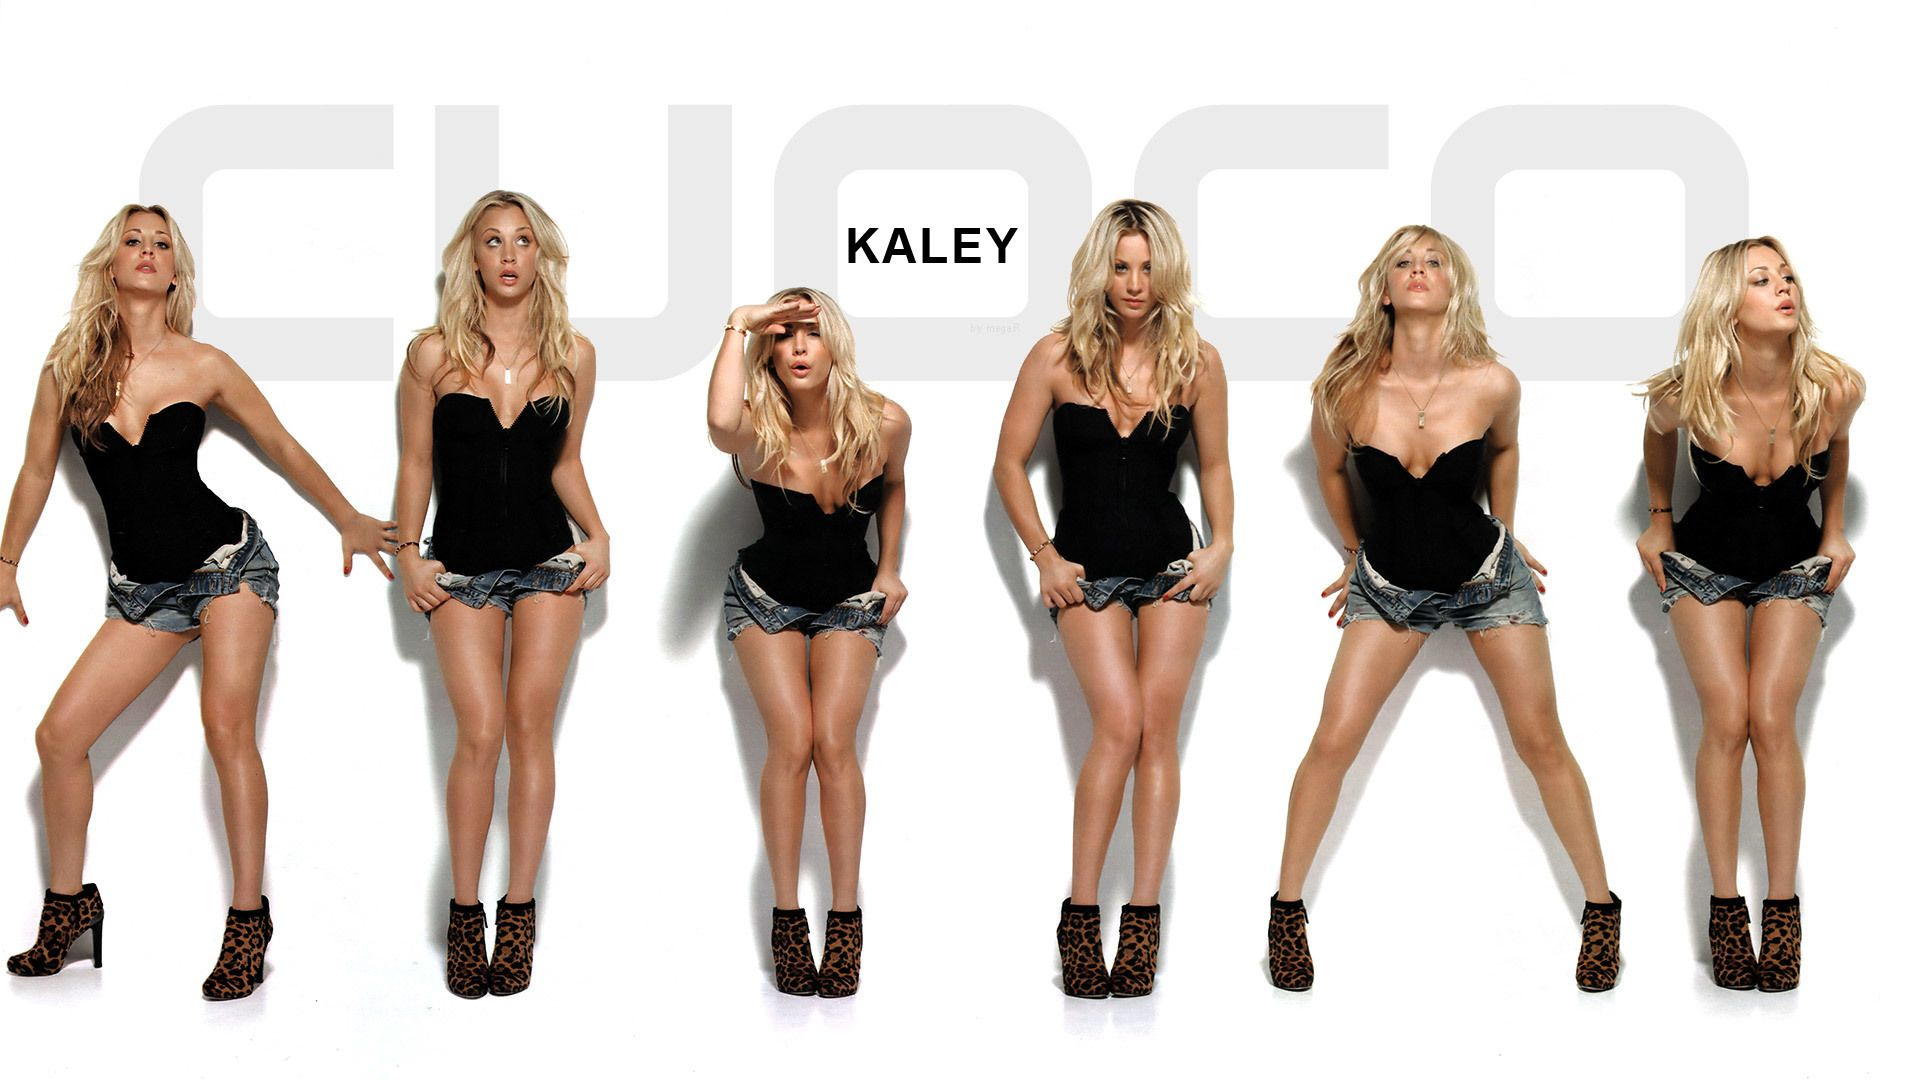 Group Of Kaley Cuoco Maxim Hd